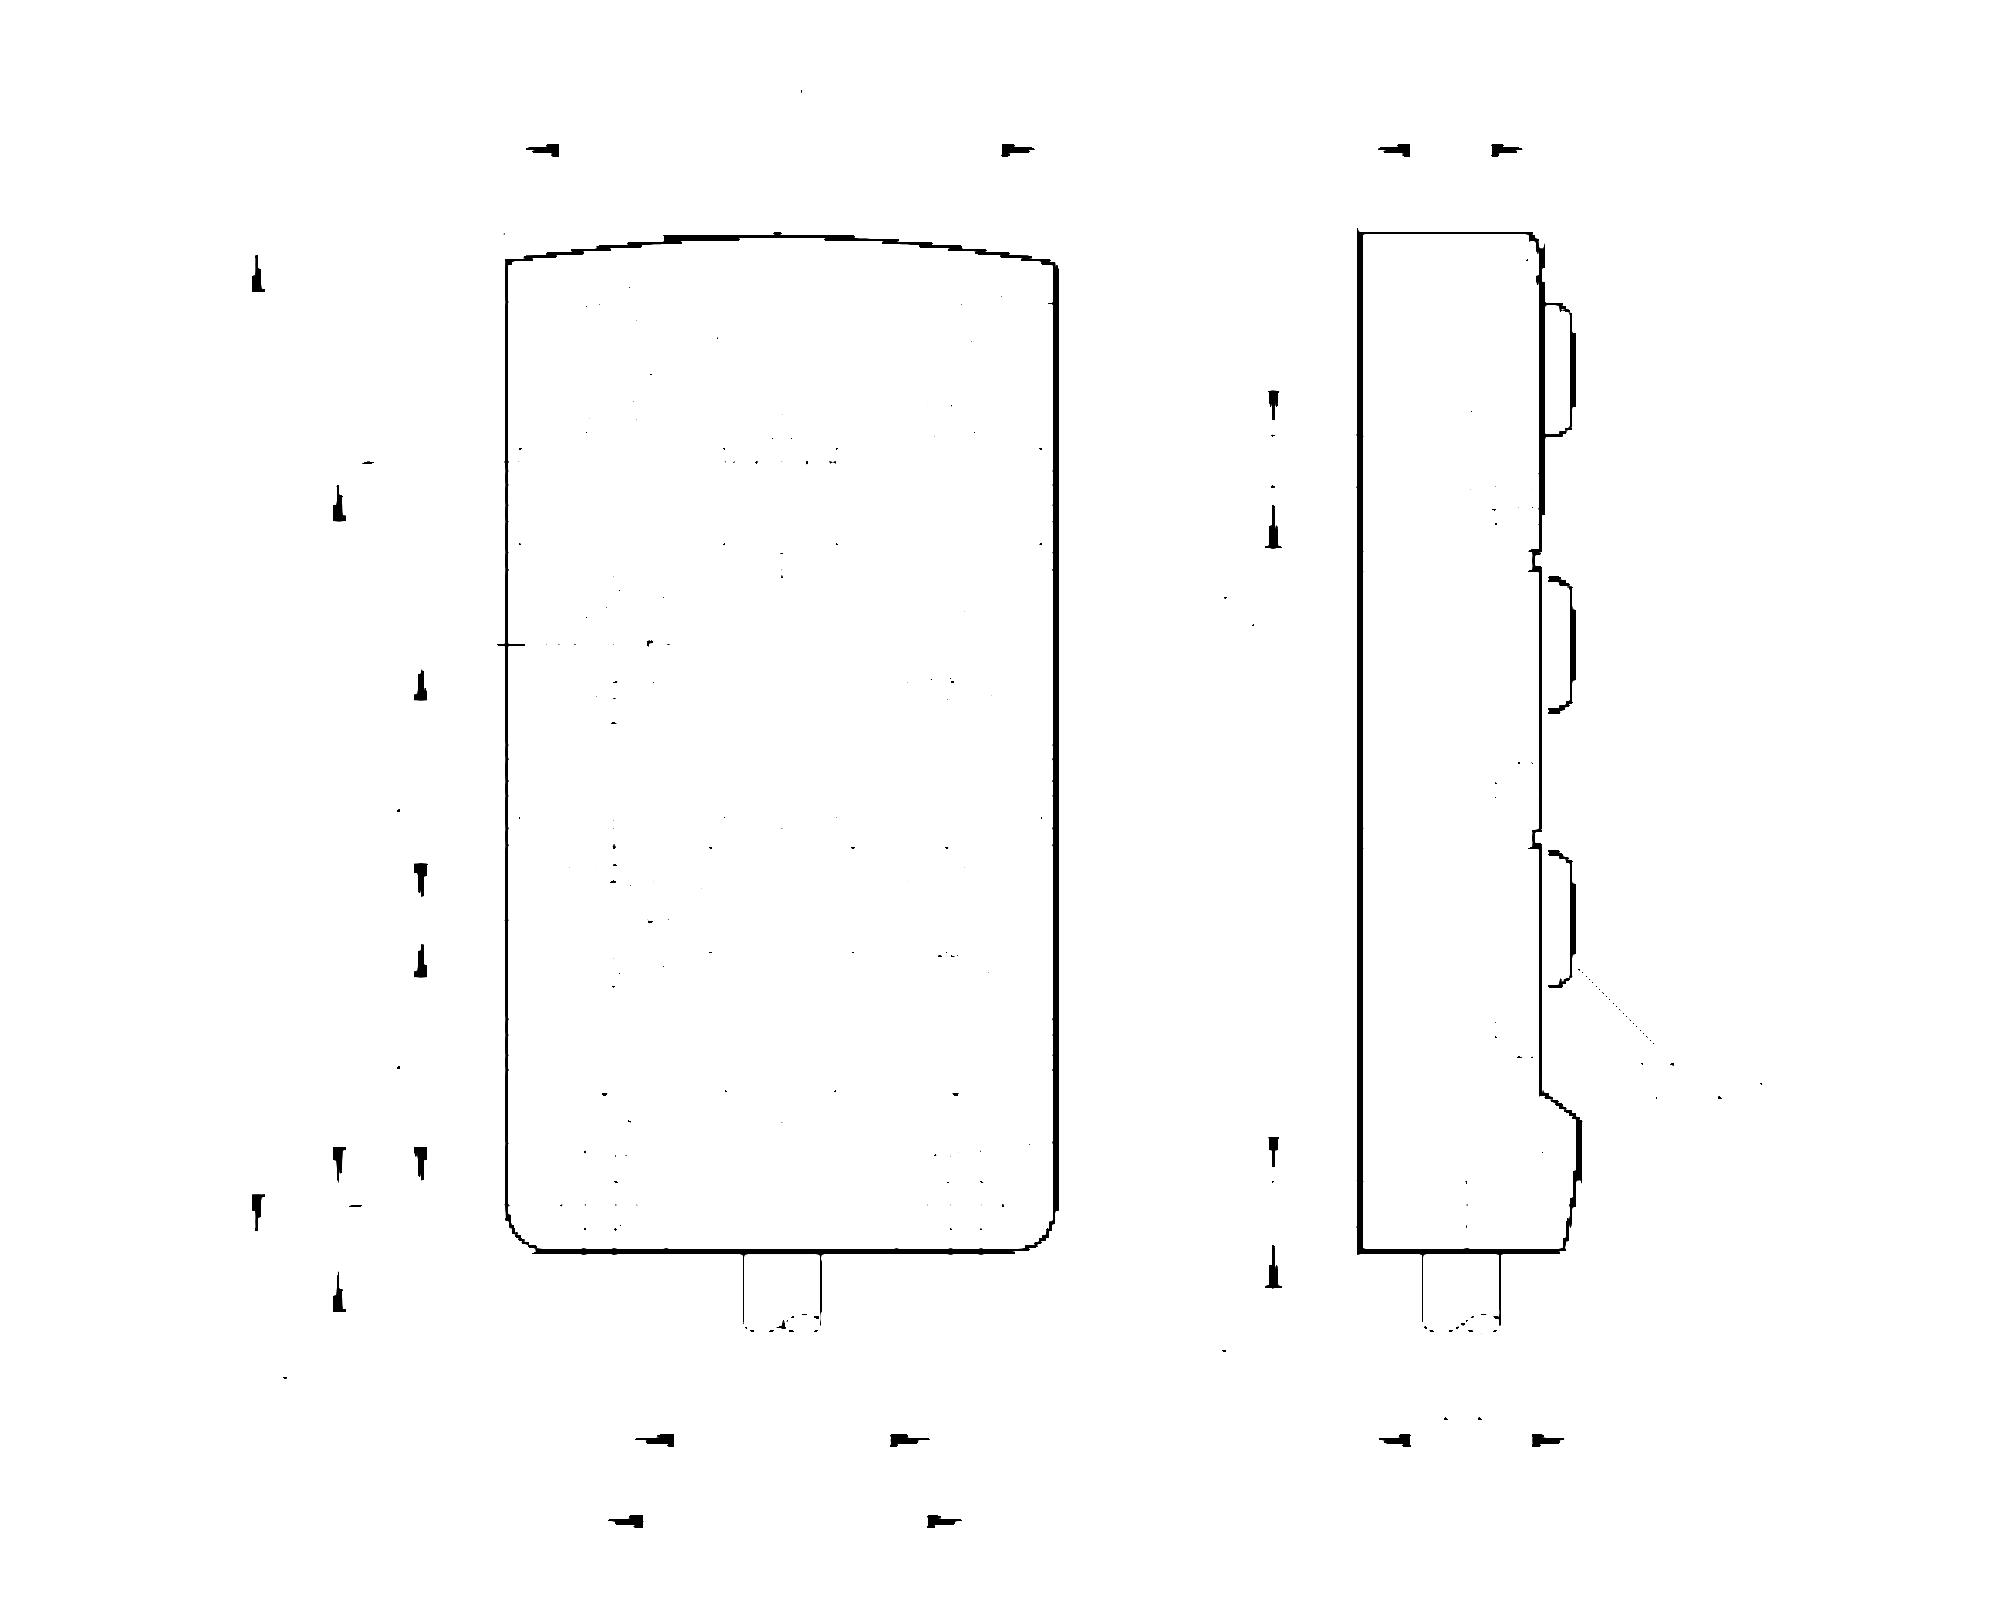 ebc020 - wiring block